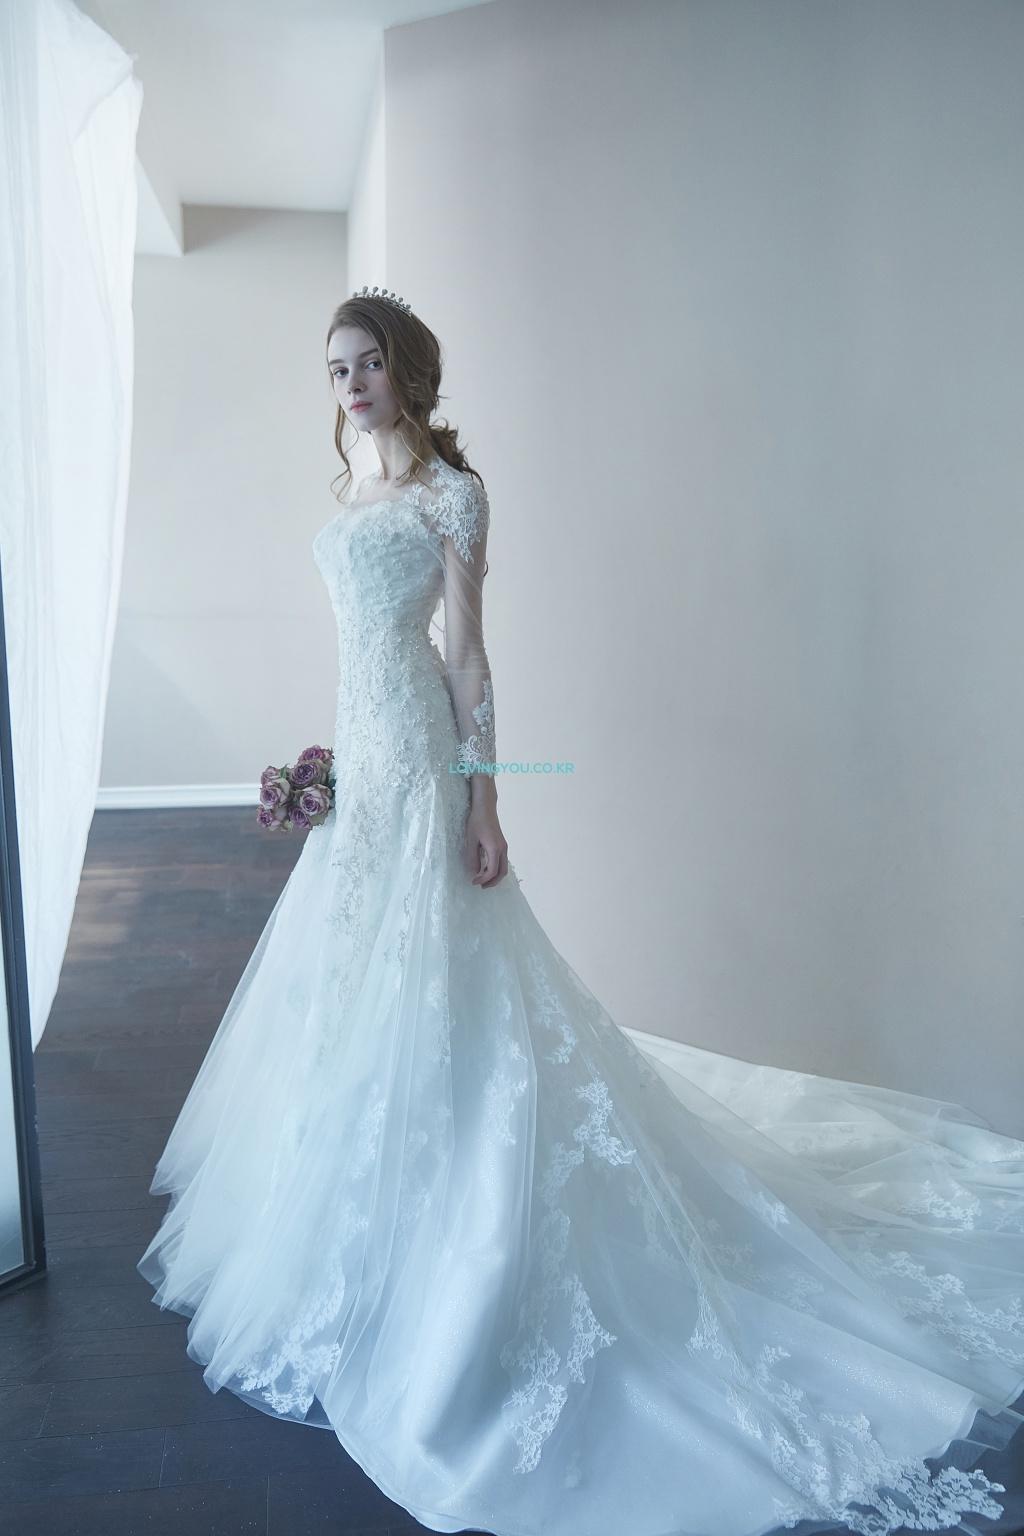 Unique Korea Wedding Dress Crest - All Wedding Dresses ...